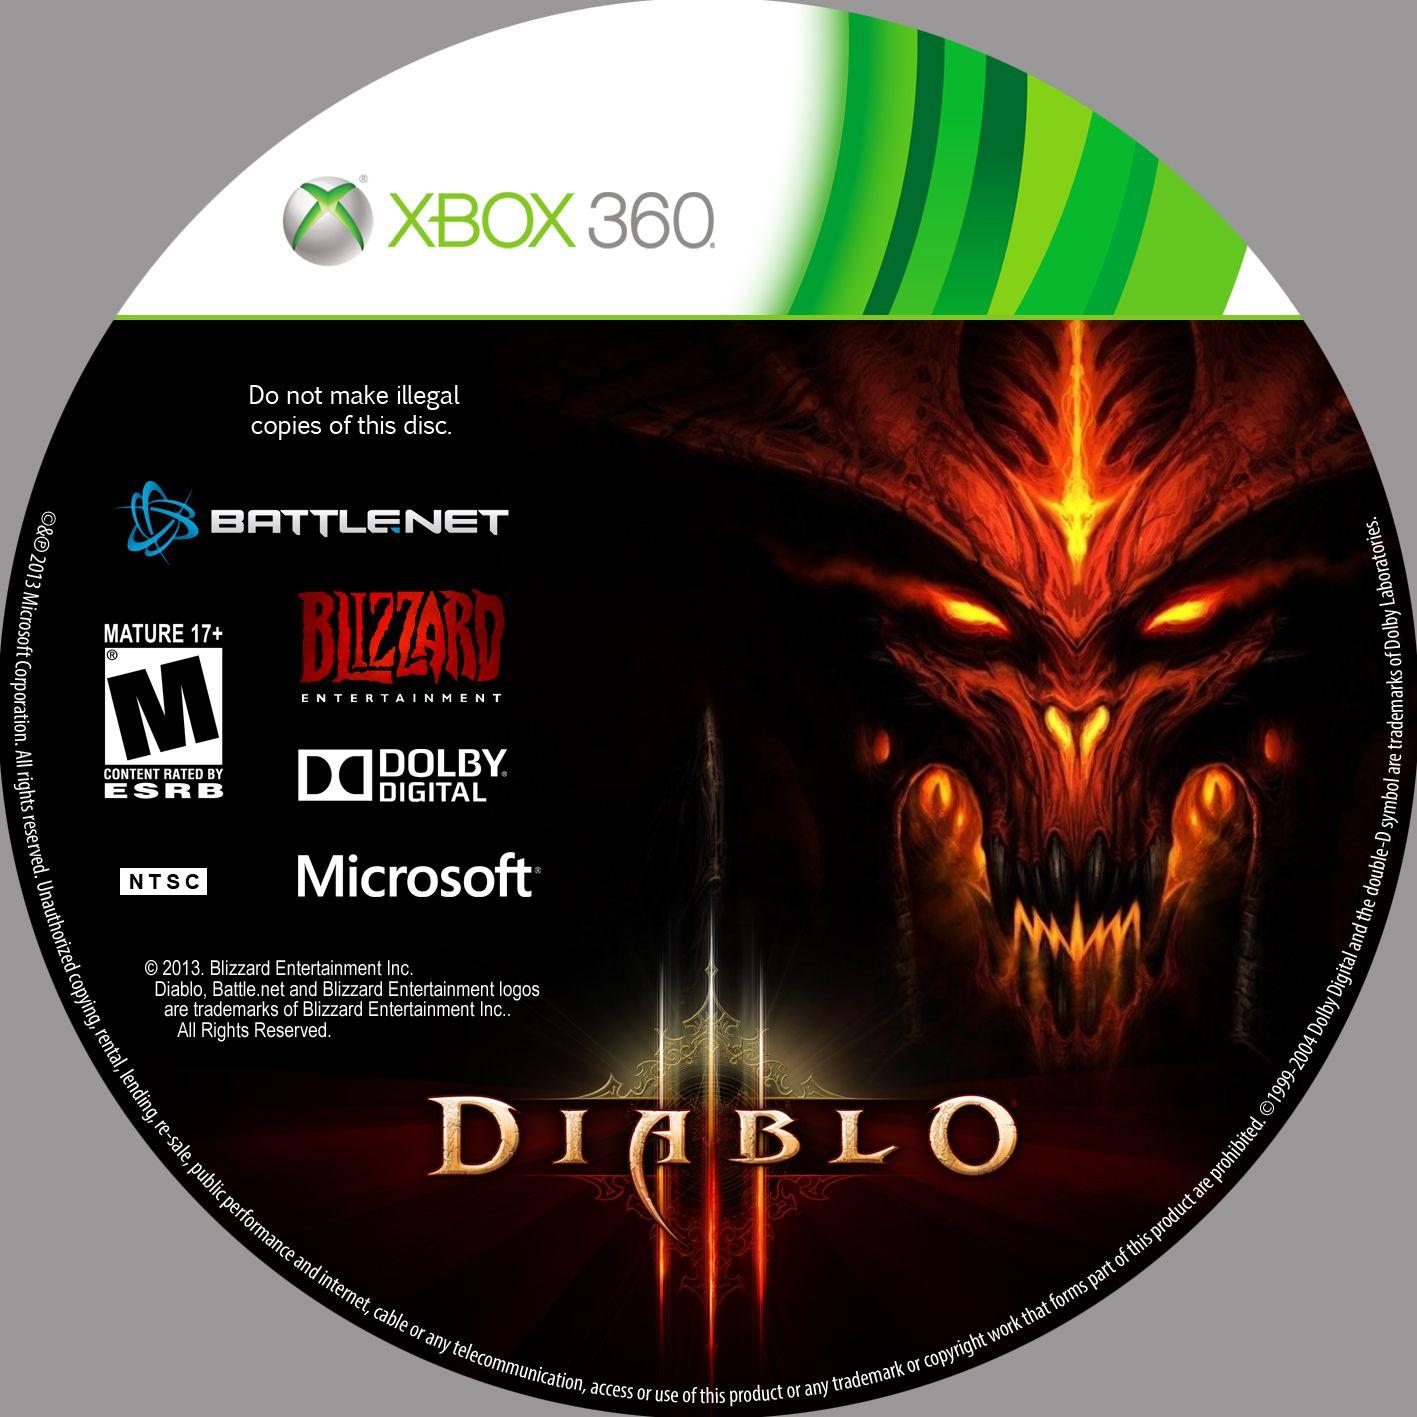 Diablo 3 xbox 360 nudepatch baixar anime fetish sluts